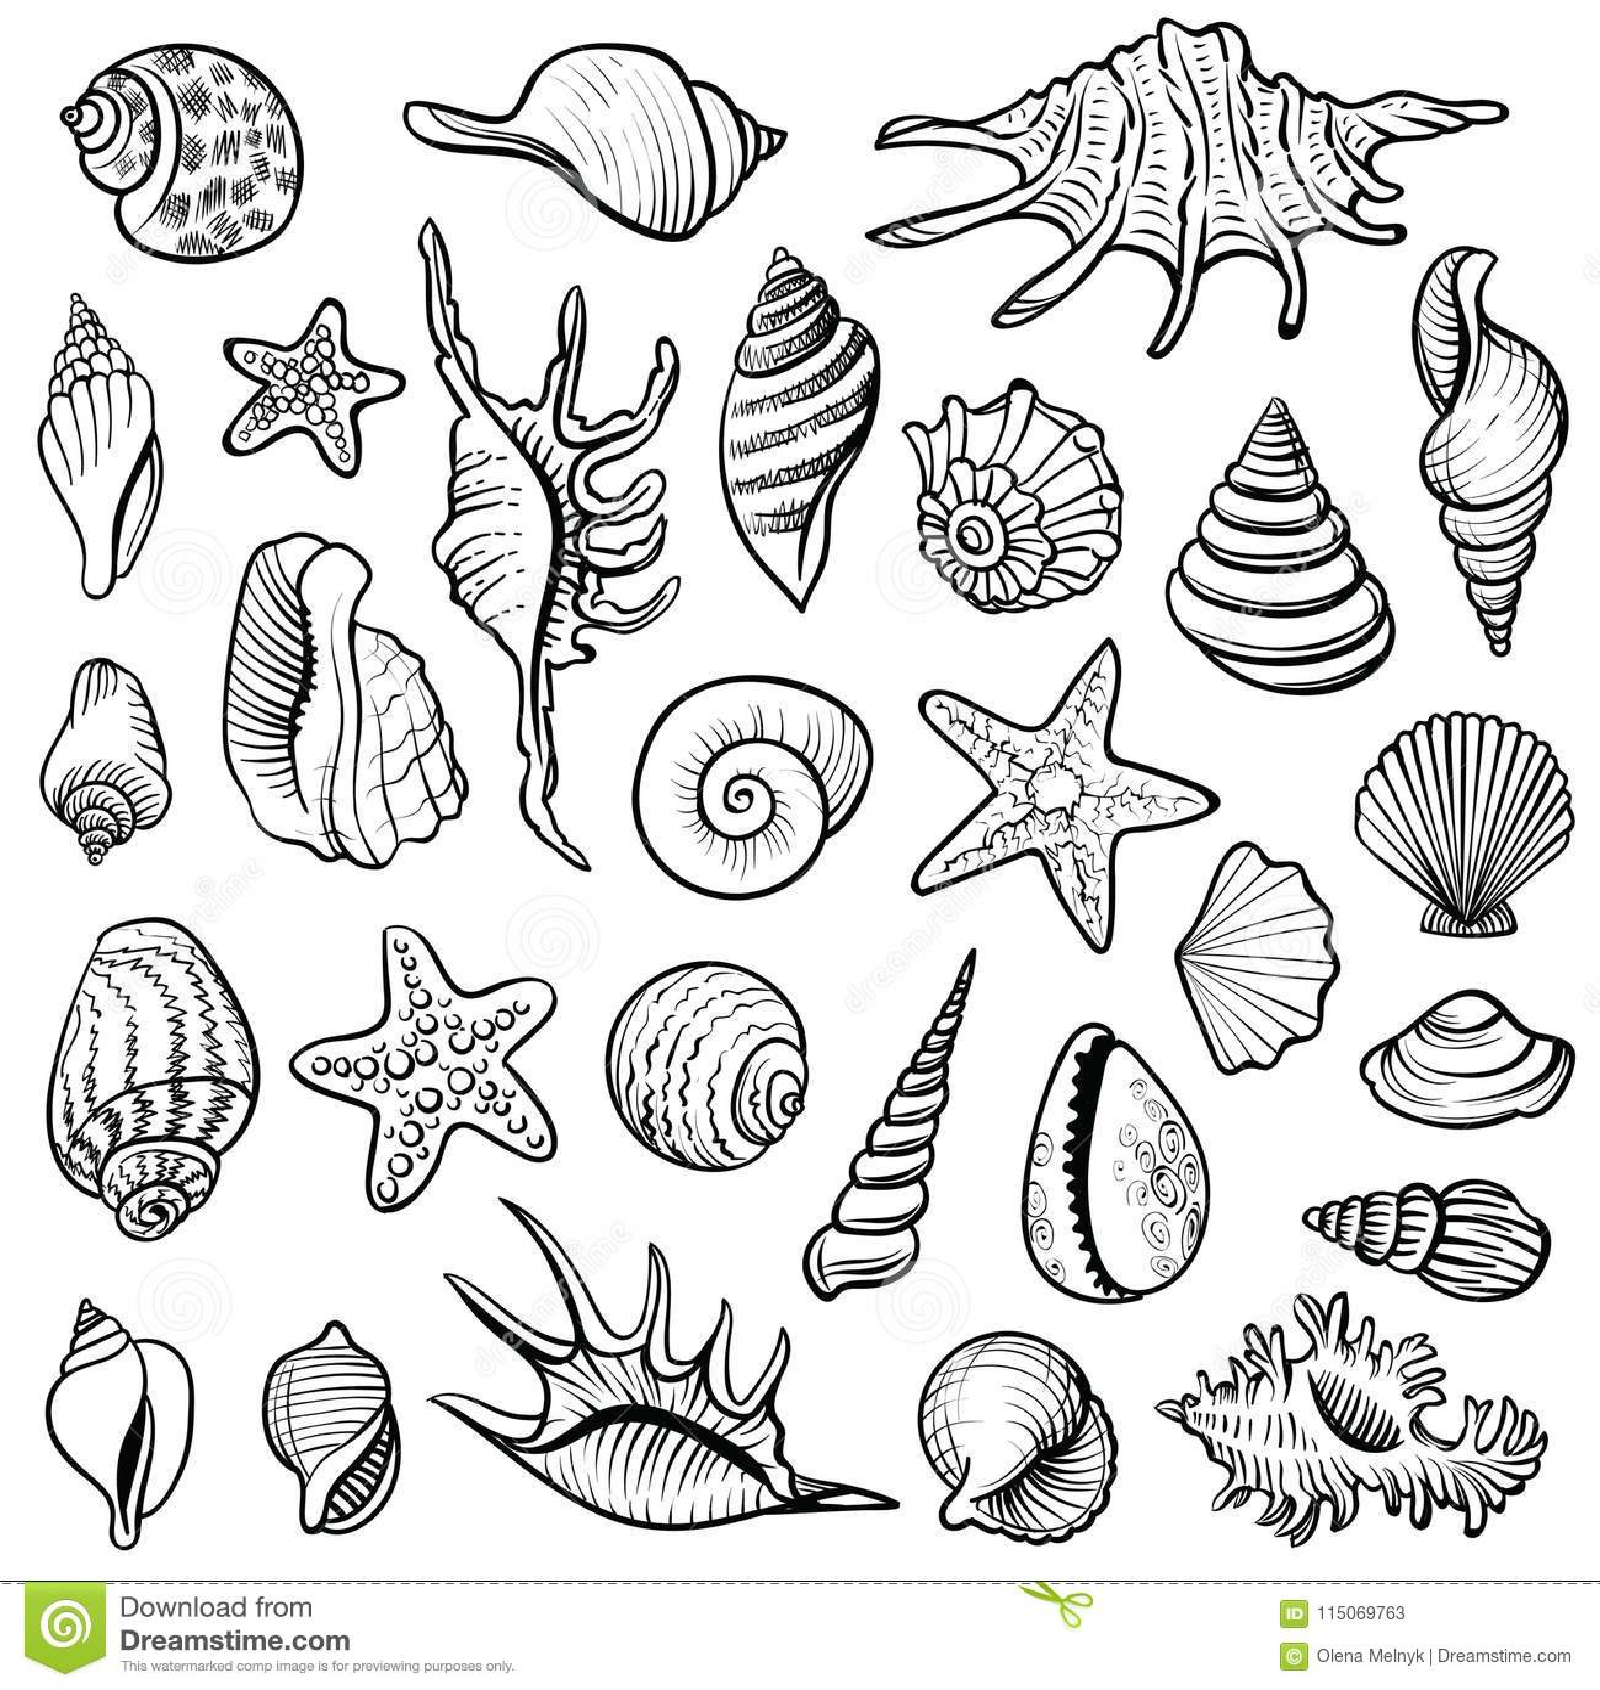 Sea shells vector line set black and white doodle illustrations